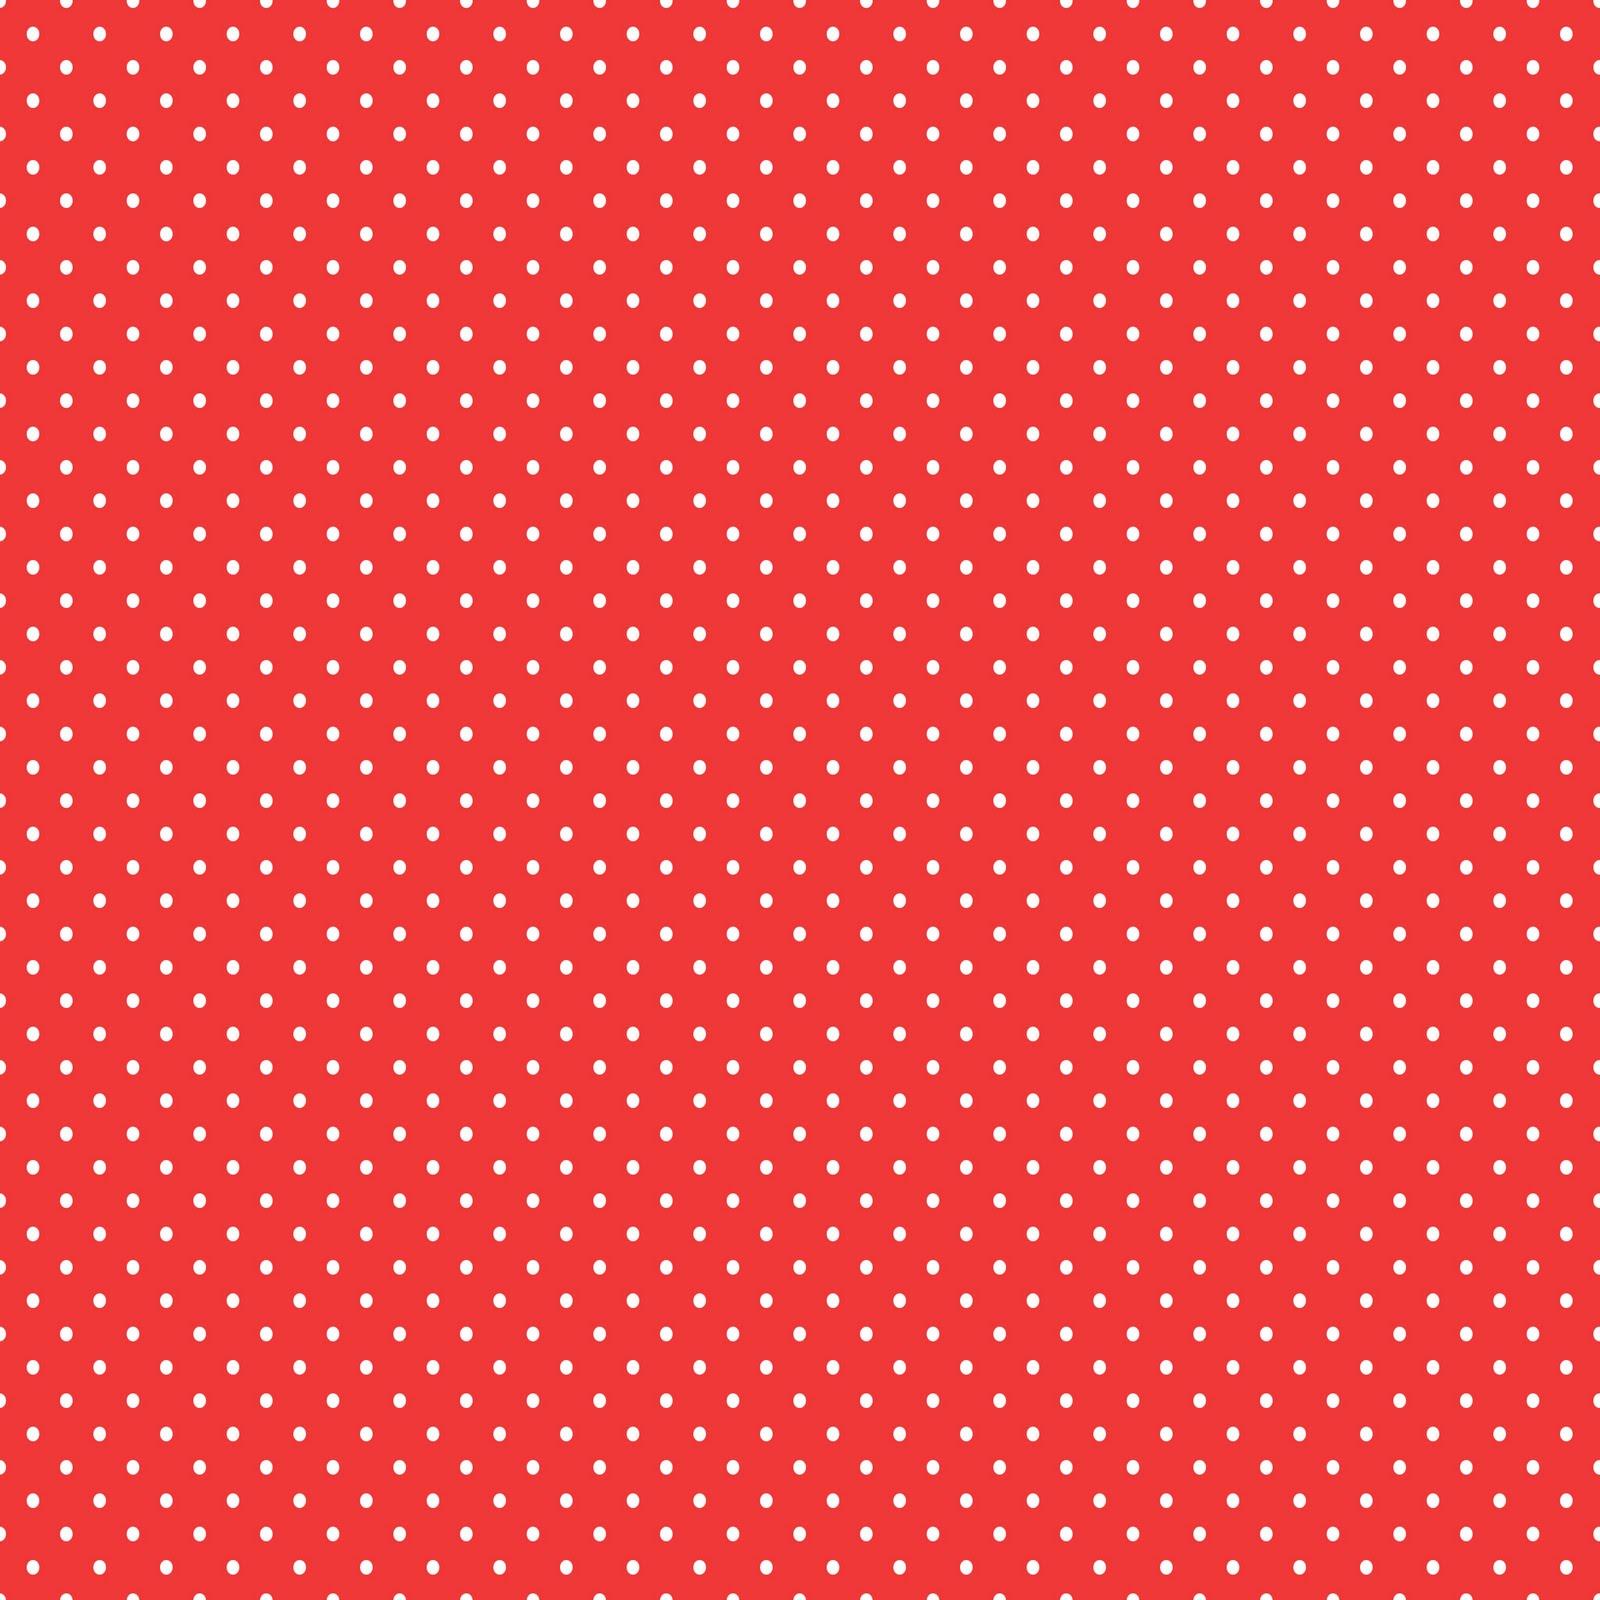 Red And White Polka Dot Wallpaper